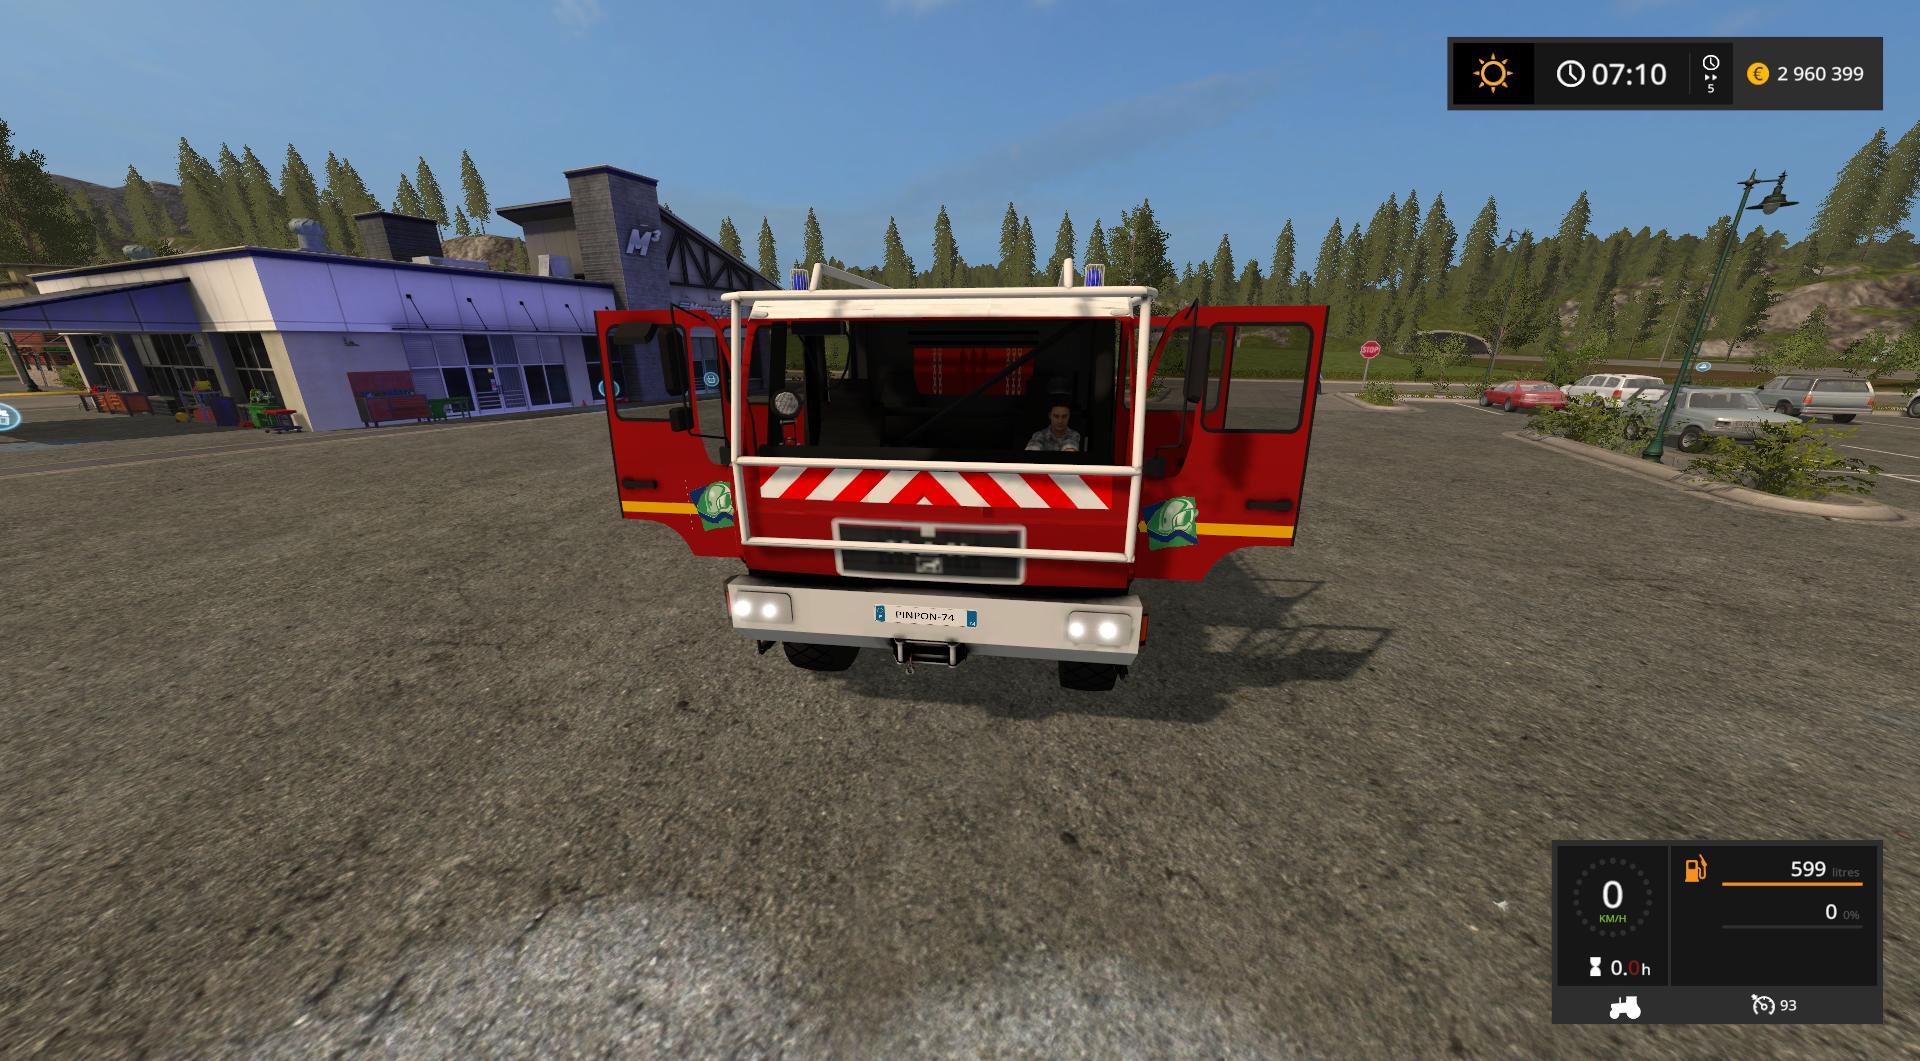 CCFM 1 et v2 0 FS17 - Farming Simulator 17 mod / FS 2017 mod